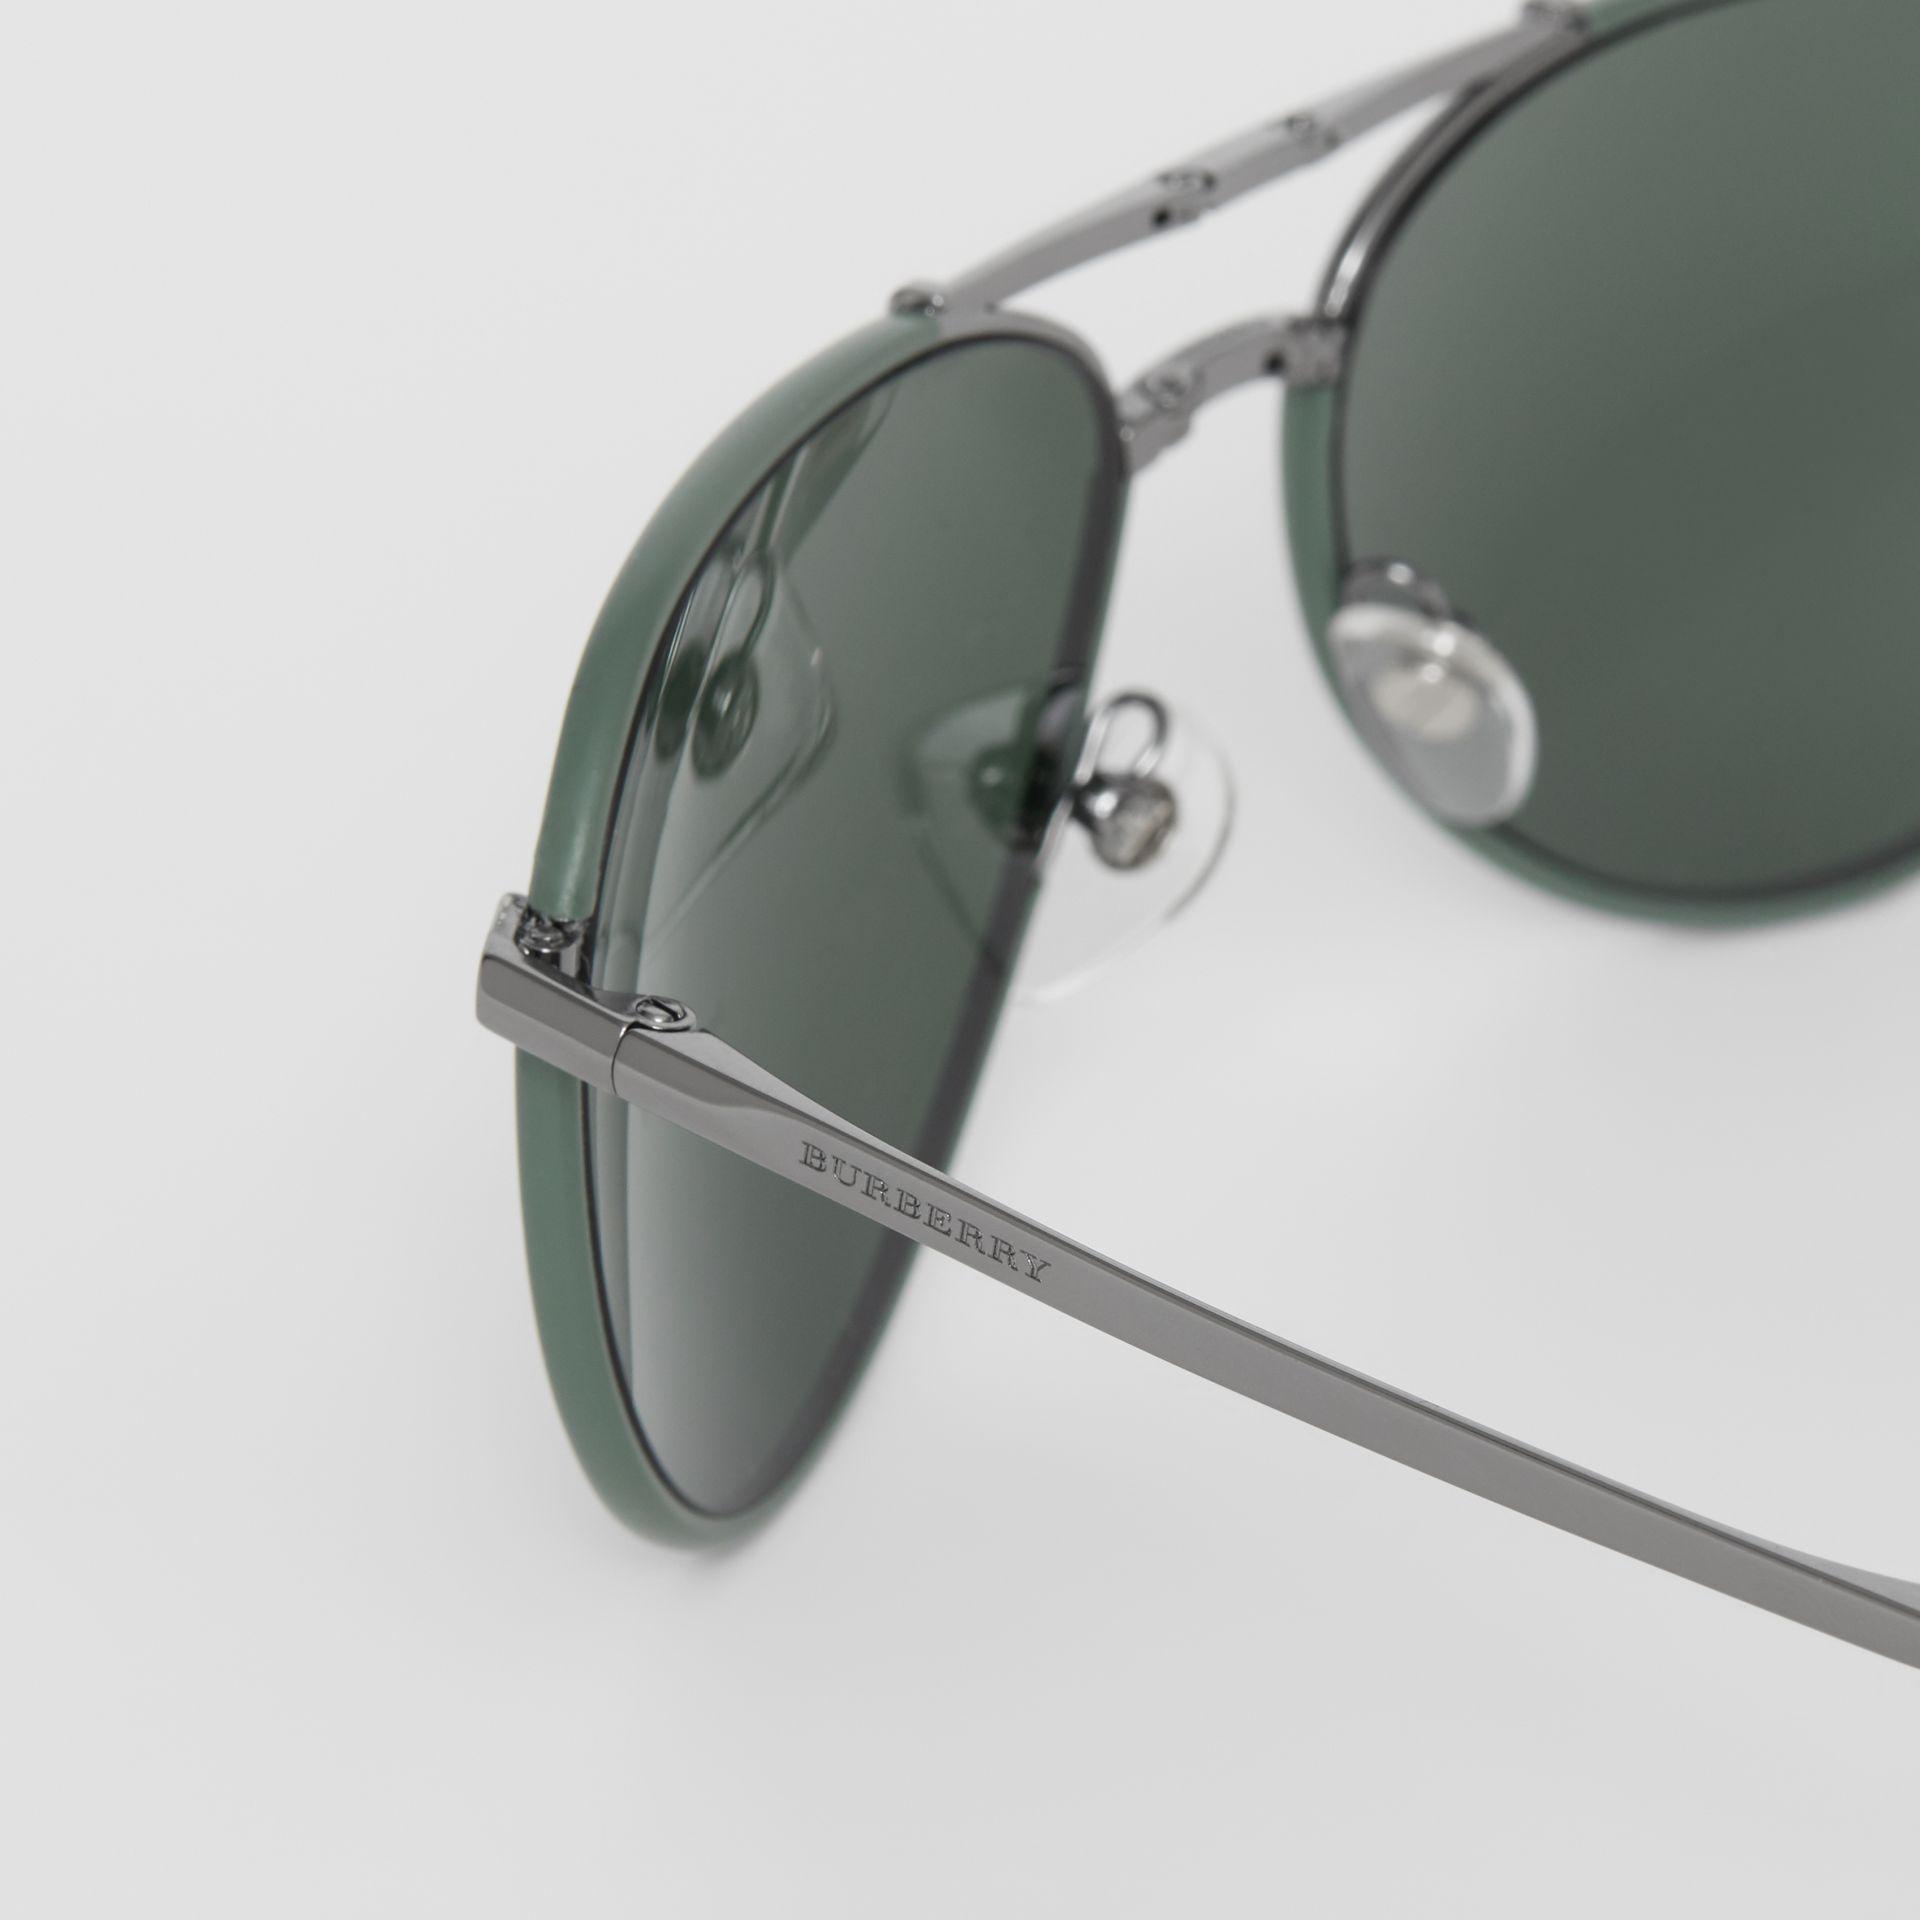 7038770a8f8 Burberry - Green Folding Pilot Sunglasses for Men - Lyst. View fullscreen